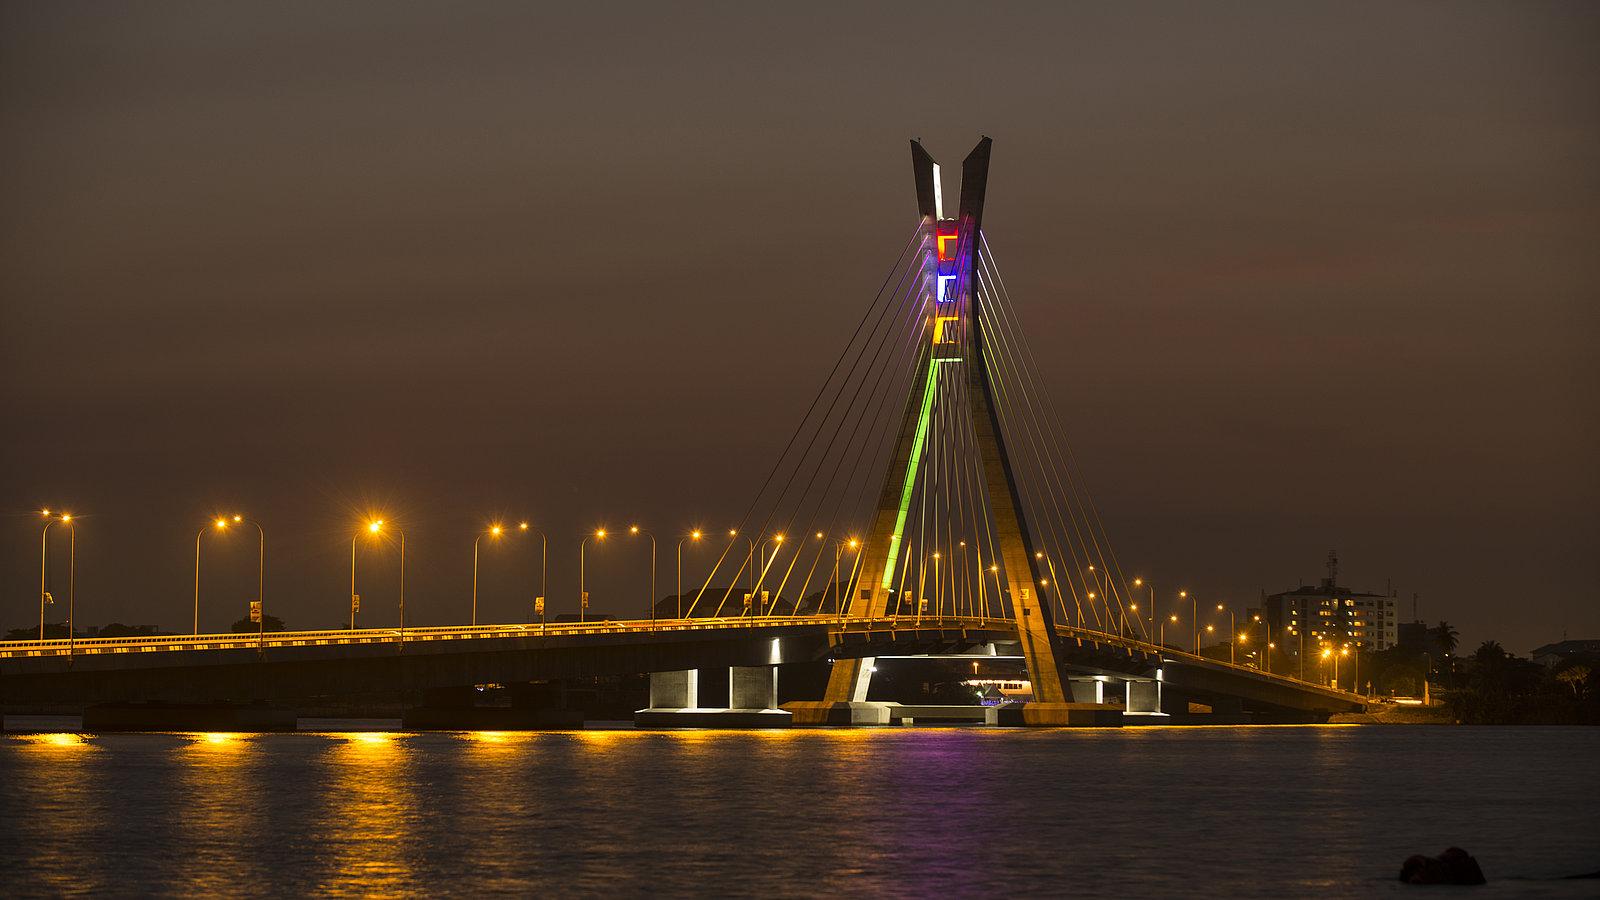 Lekki-Ikoyi Bridge in Lagos